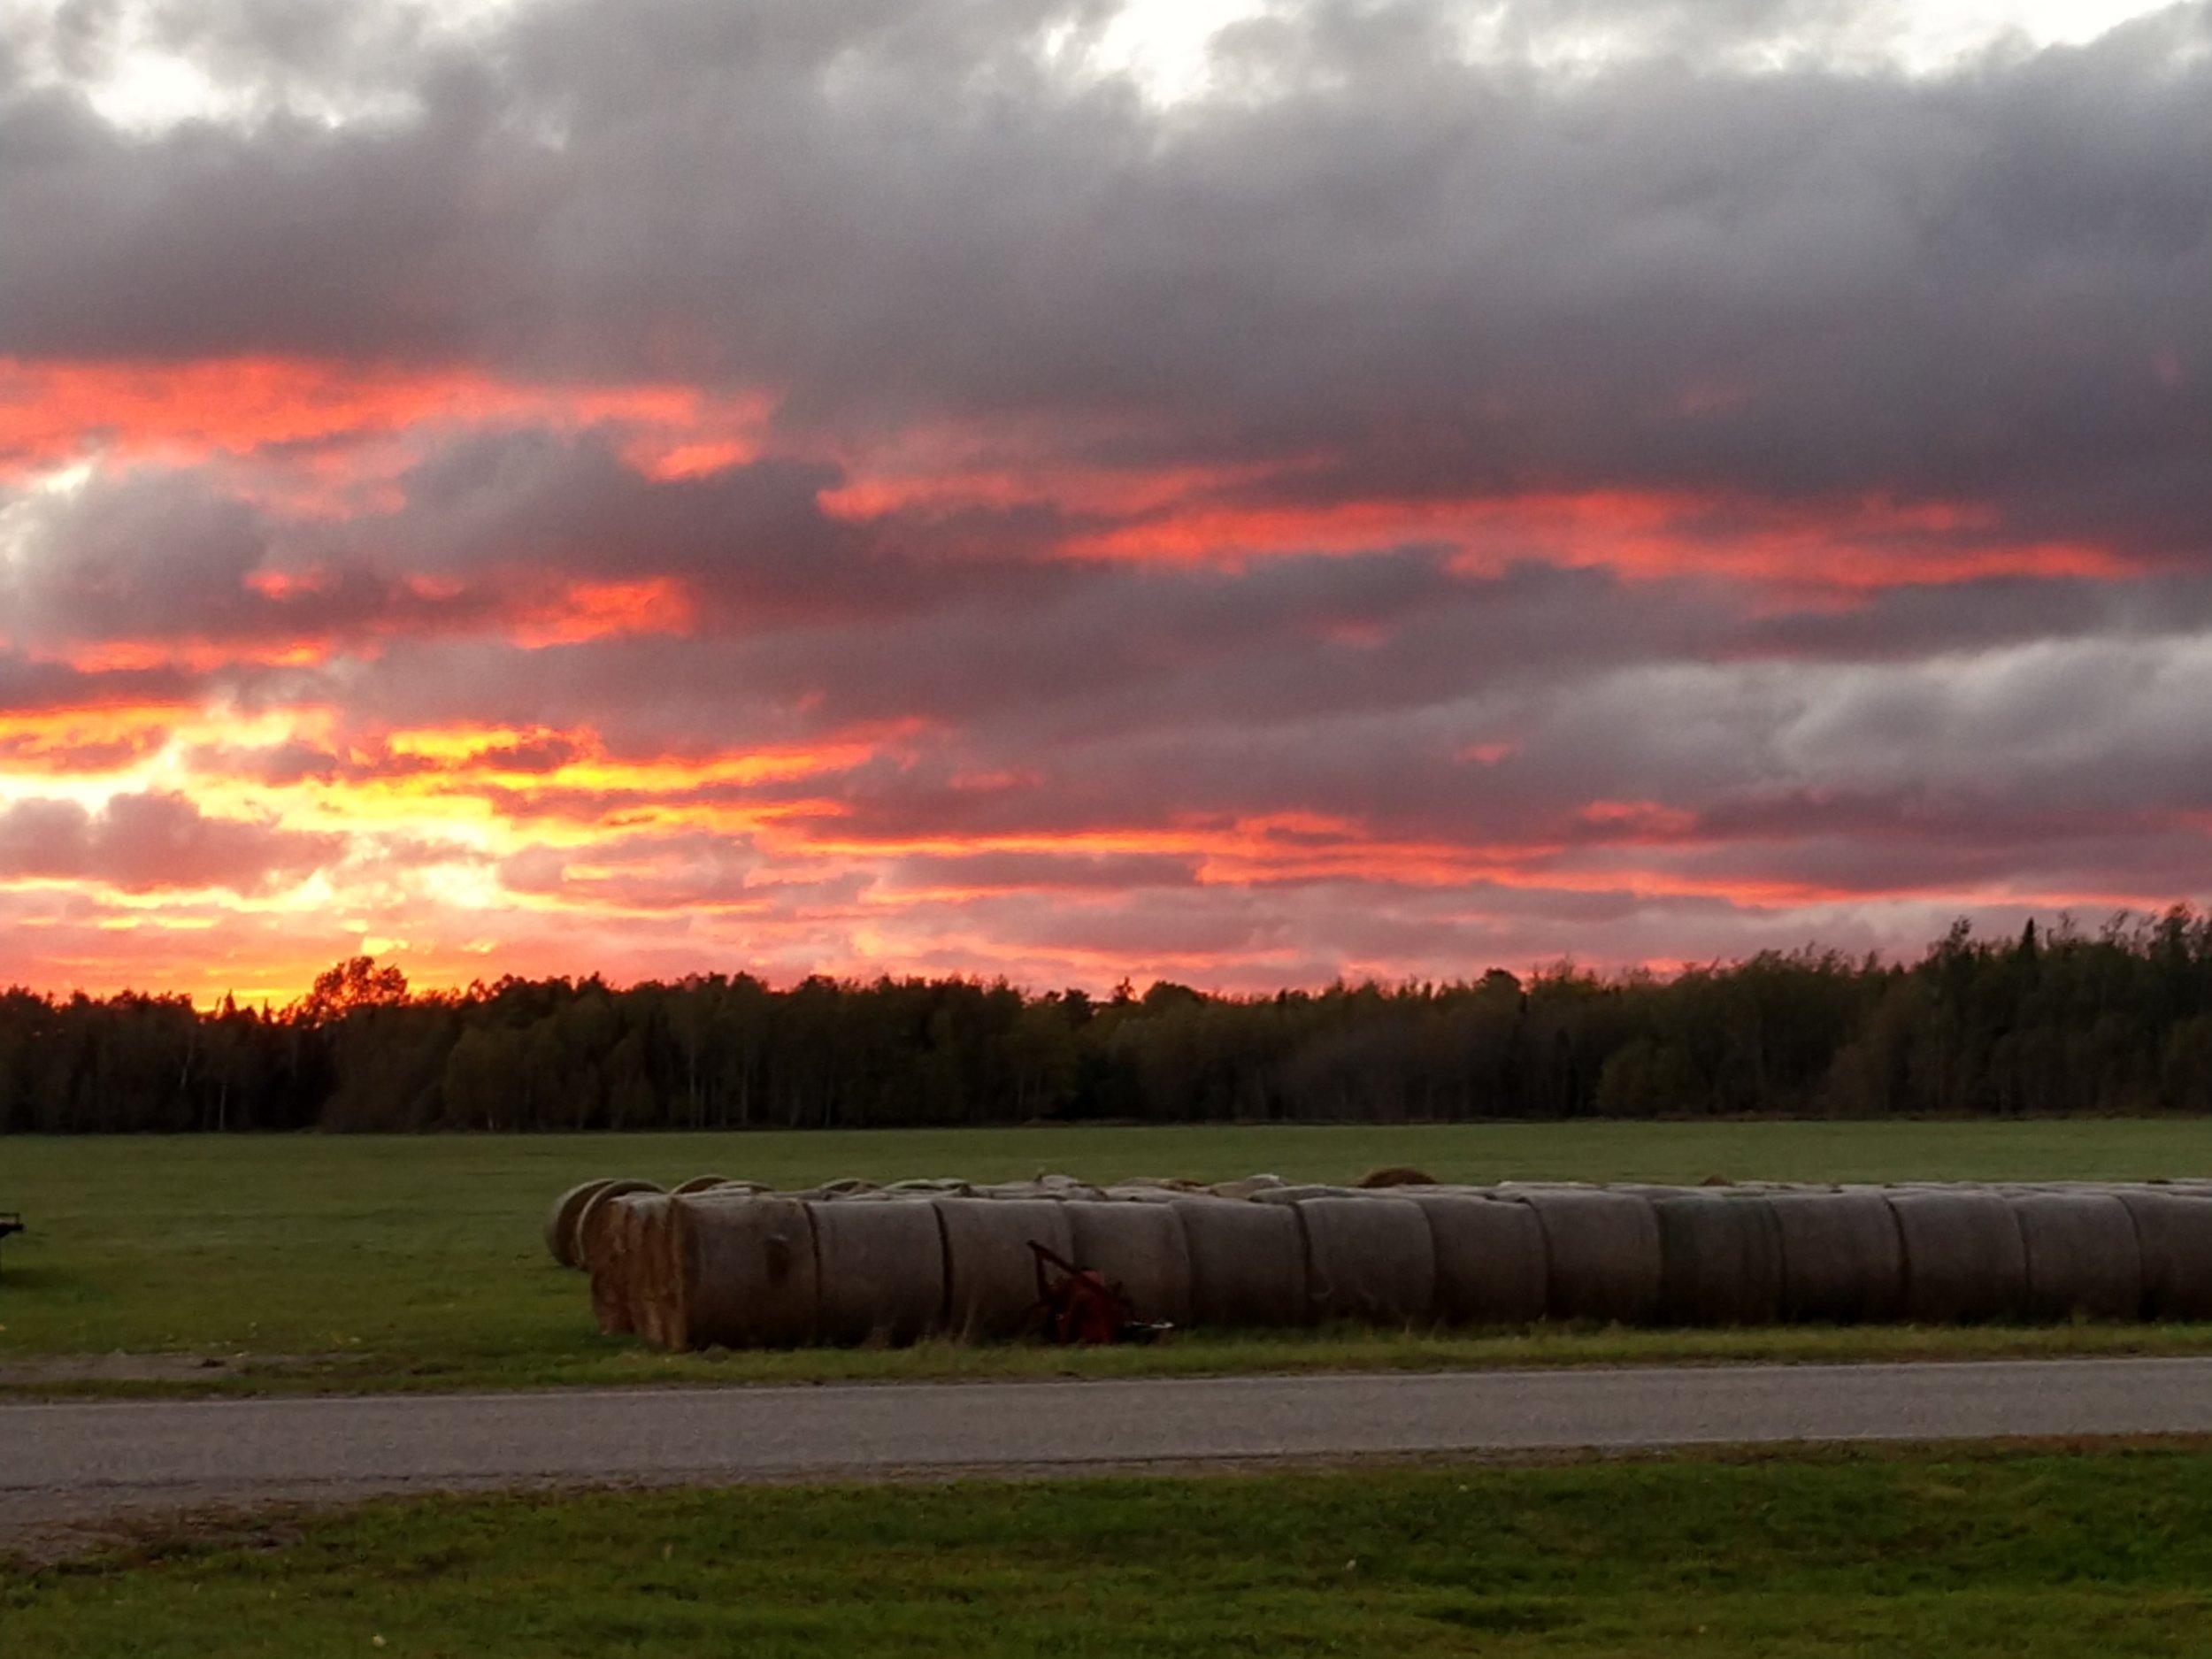 cover photo - orange sky over hay bales.jpg